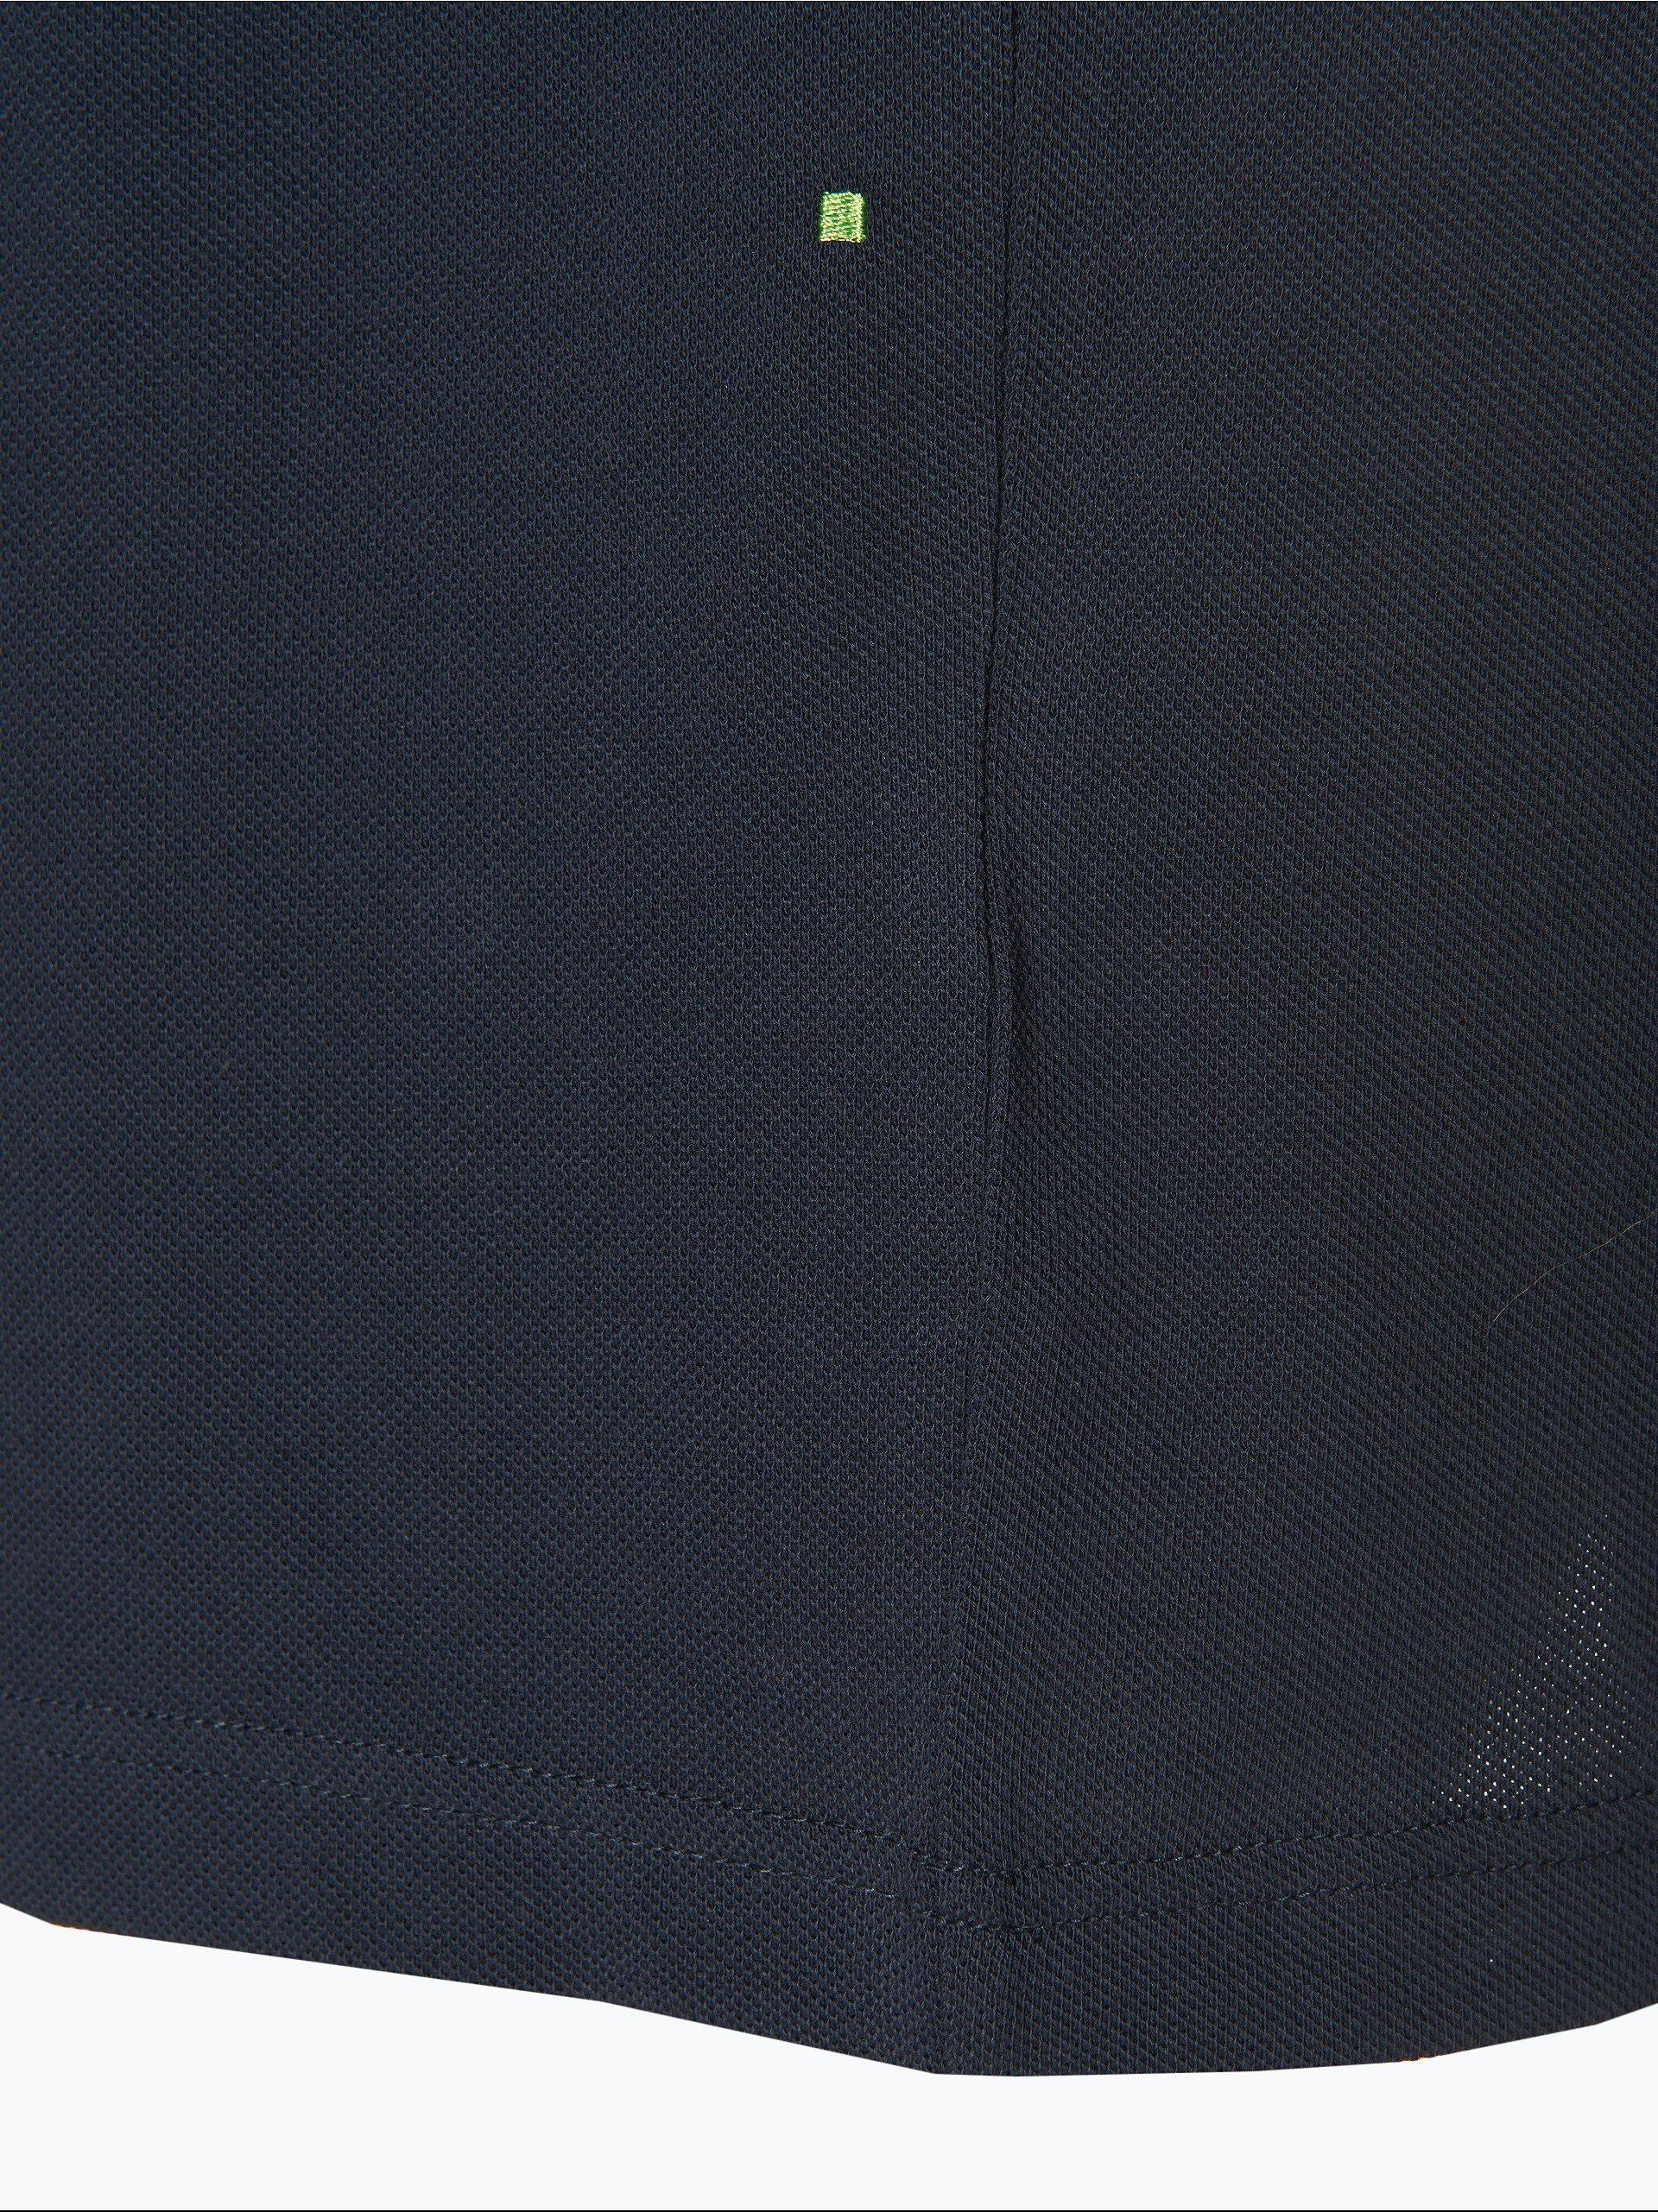 BOSS Athleisurewear Herren Poloshirt - Paddy